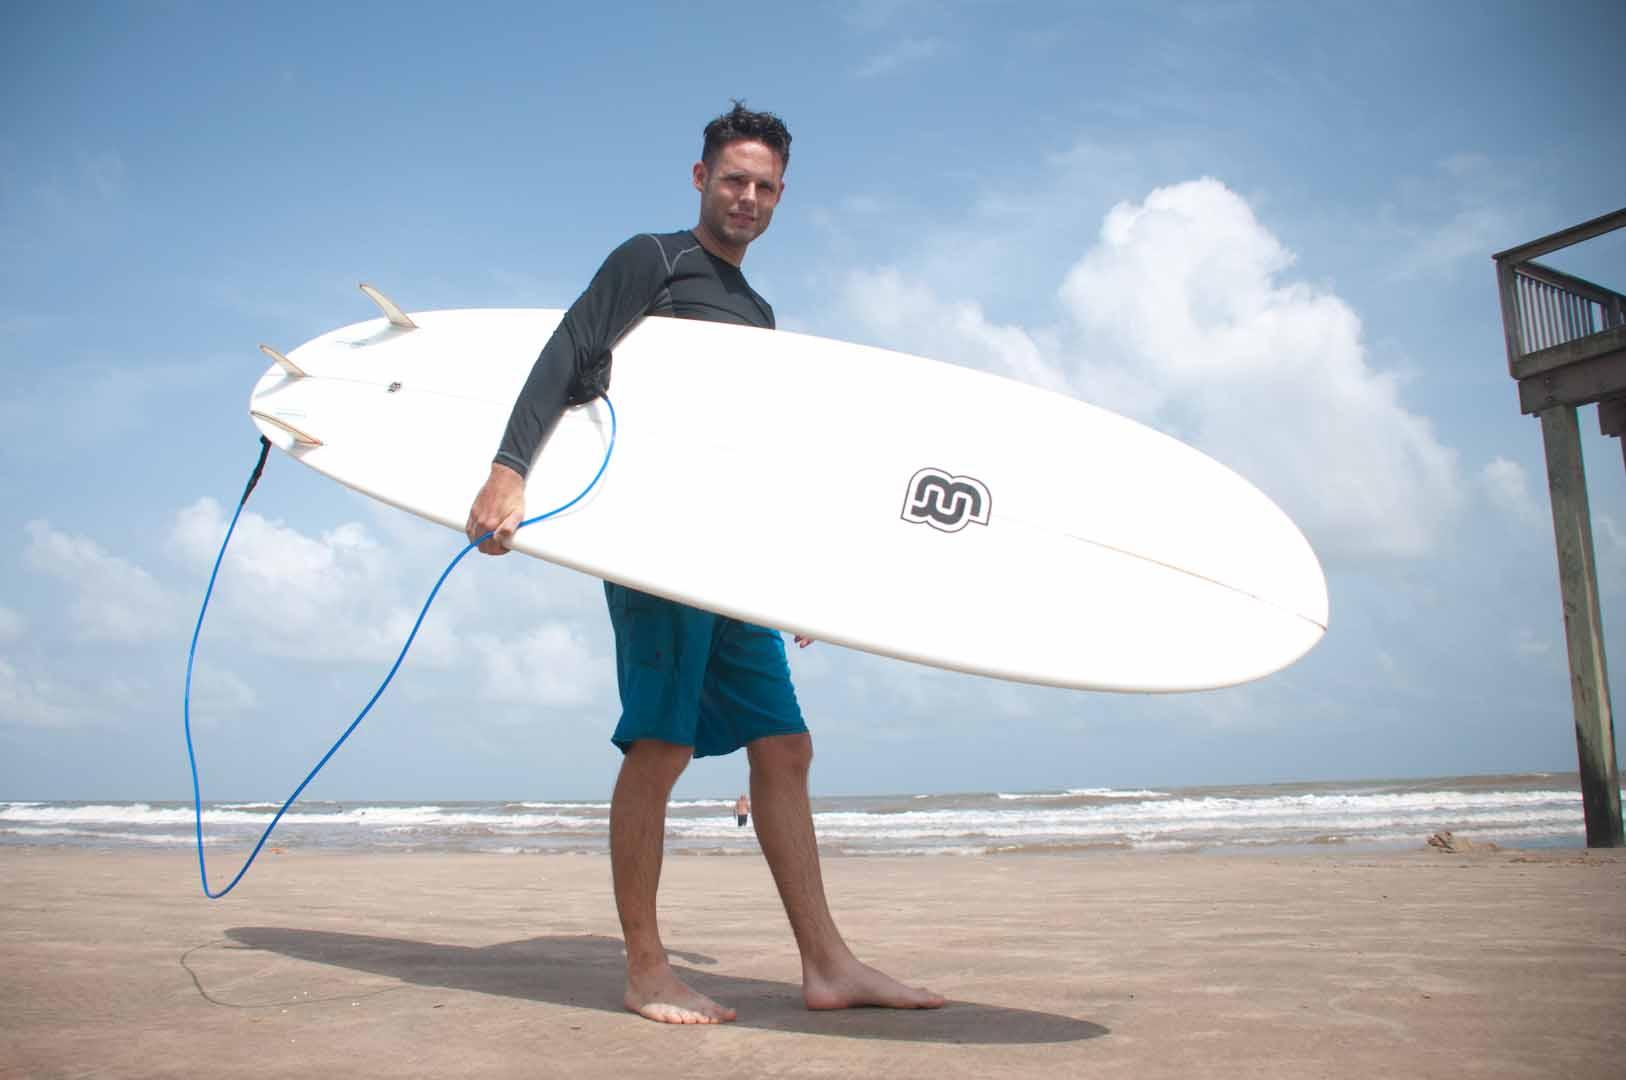 SurfsideJuly2_20150702_024